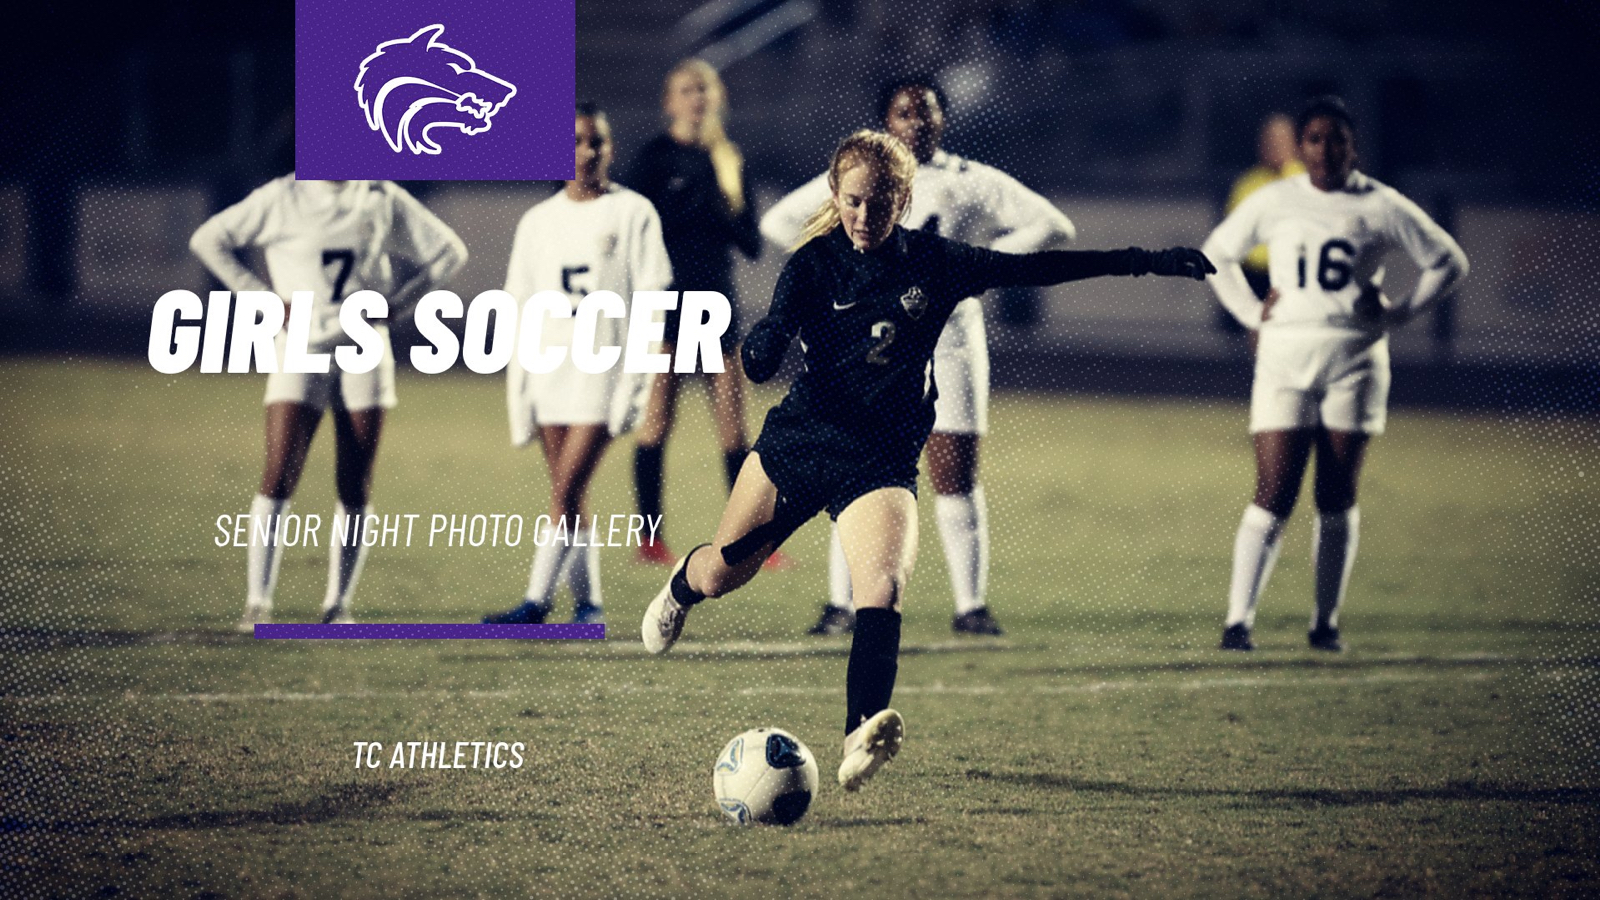 Girls Soccer | Senior Night Photo Gallery